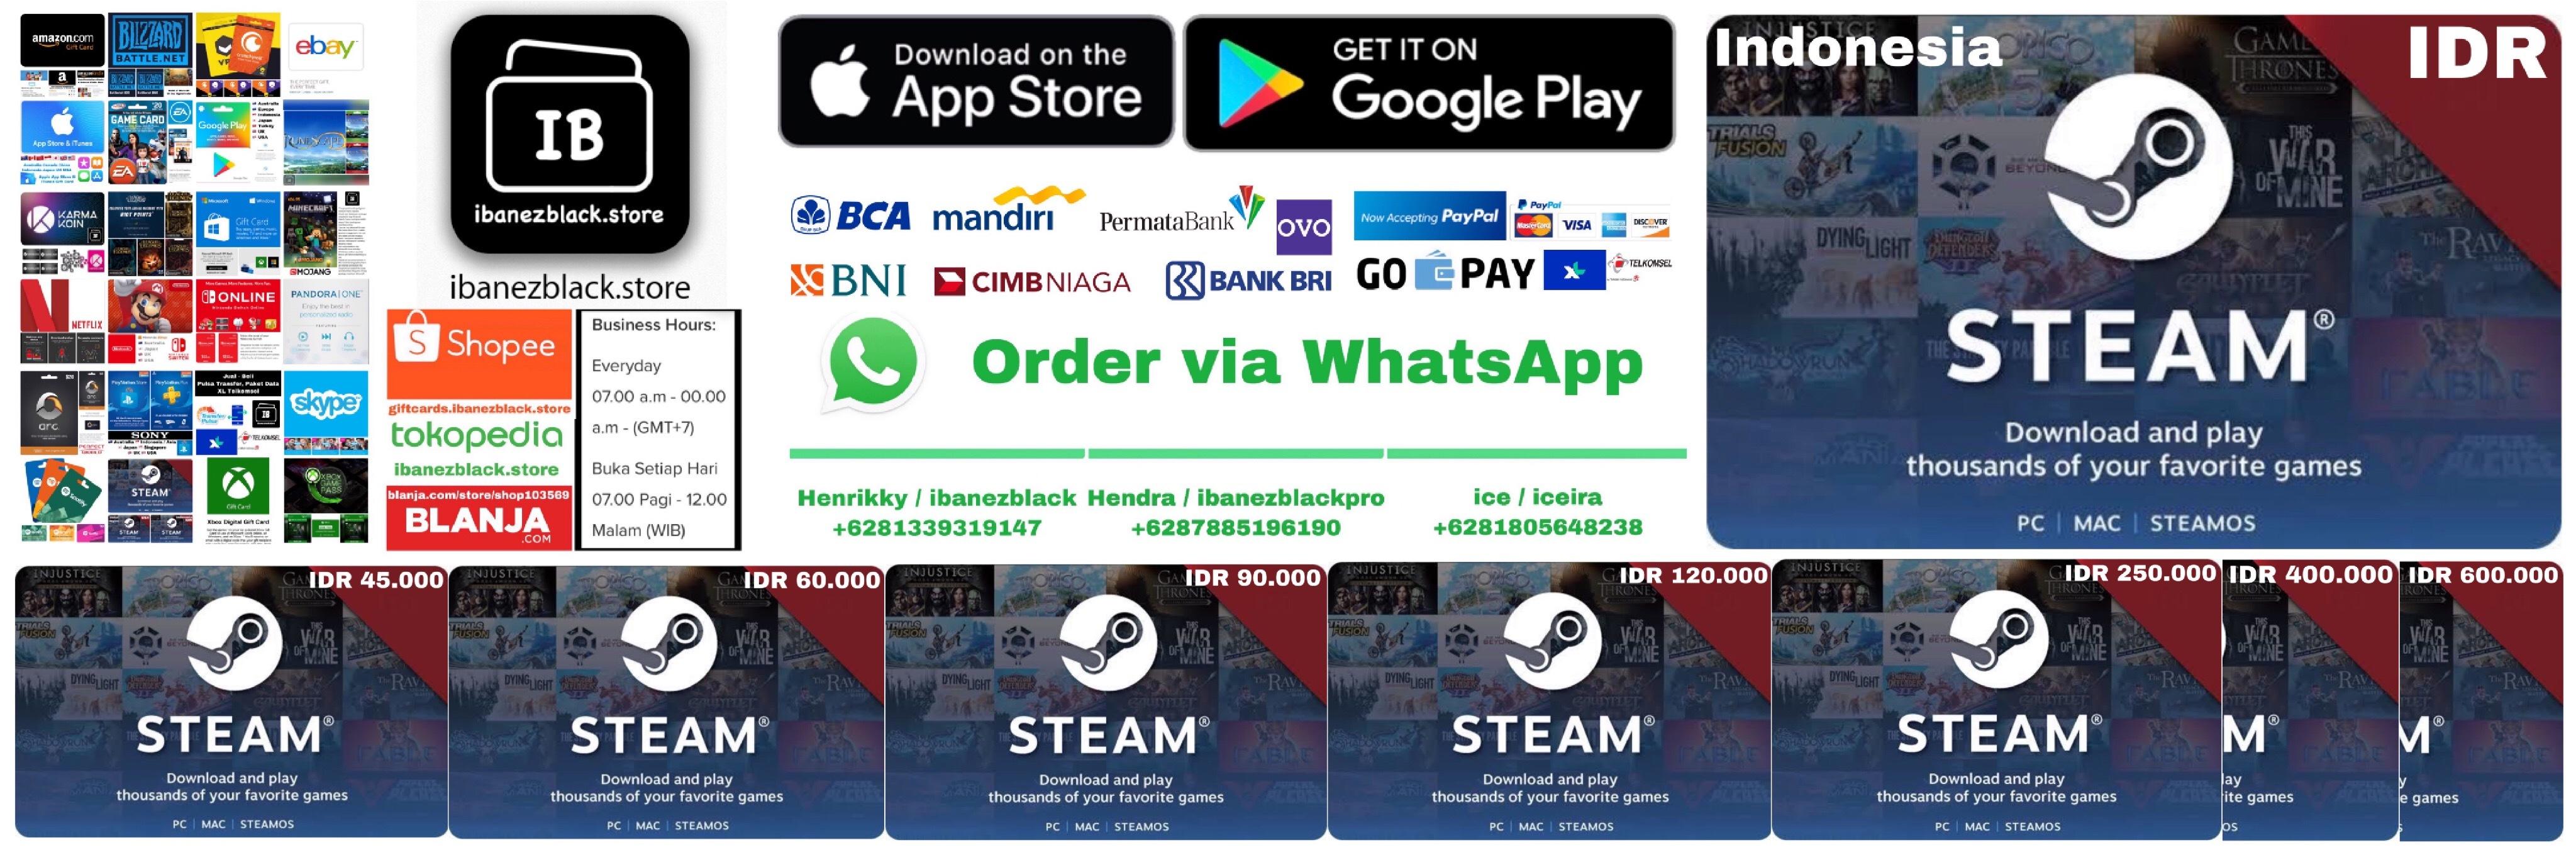 Steam Wallet Code Indonesia IDR 45000 60000 90000 120000 250000 400000 600000